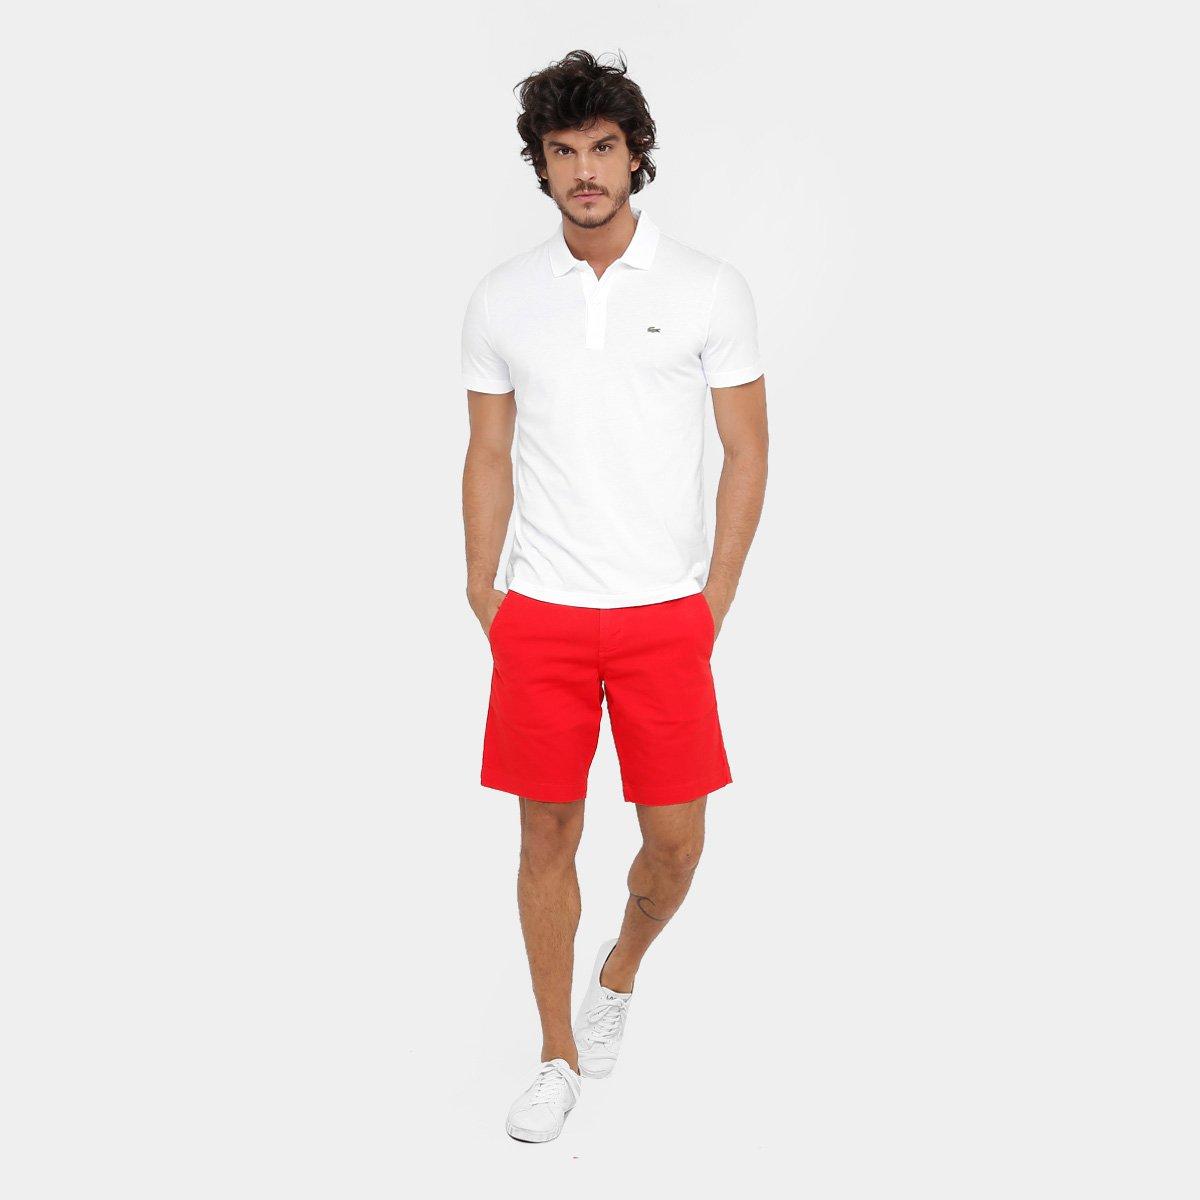 Camisa Polo Lacoste Malha Original Fit Masculina - Branco - Compre ... 875090666d